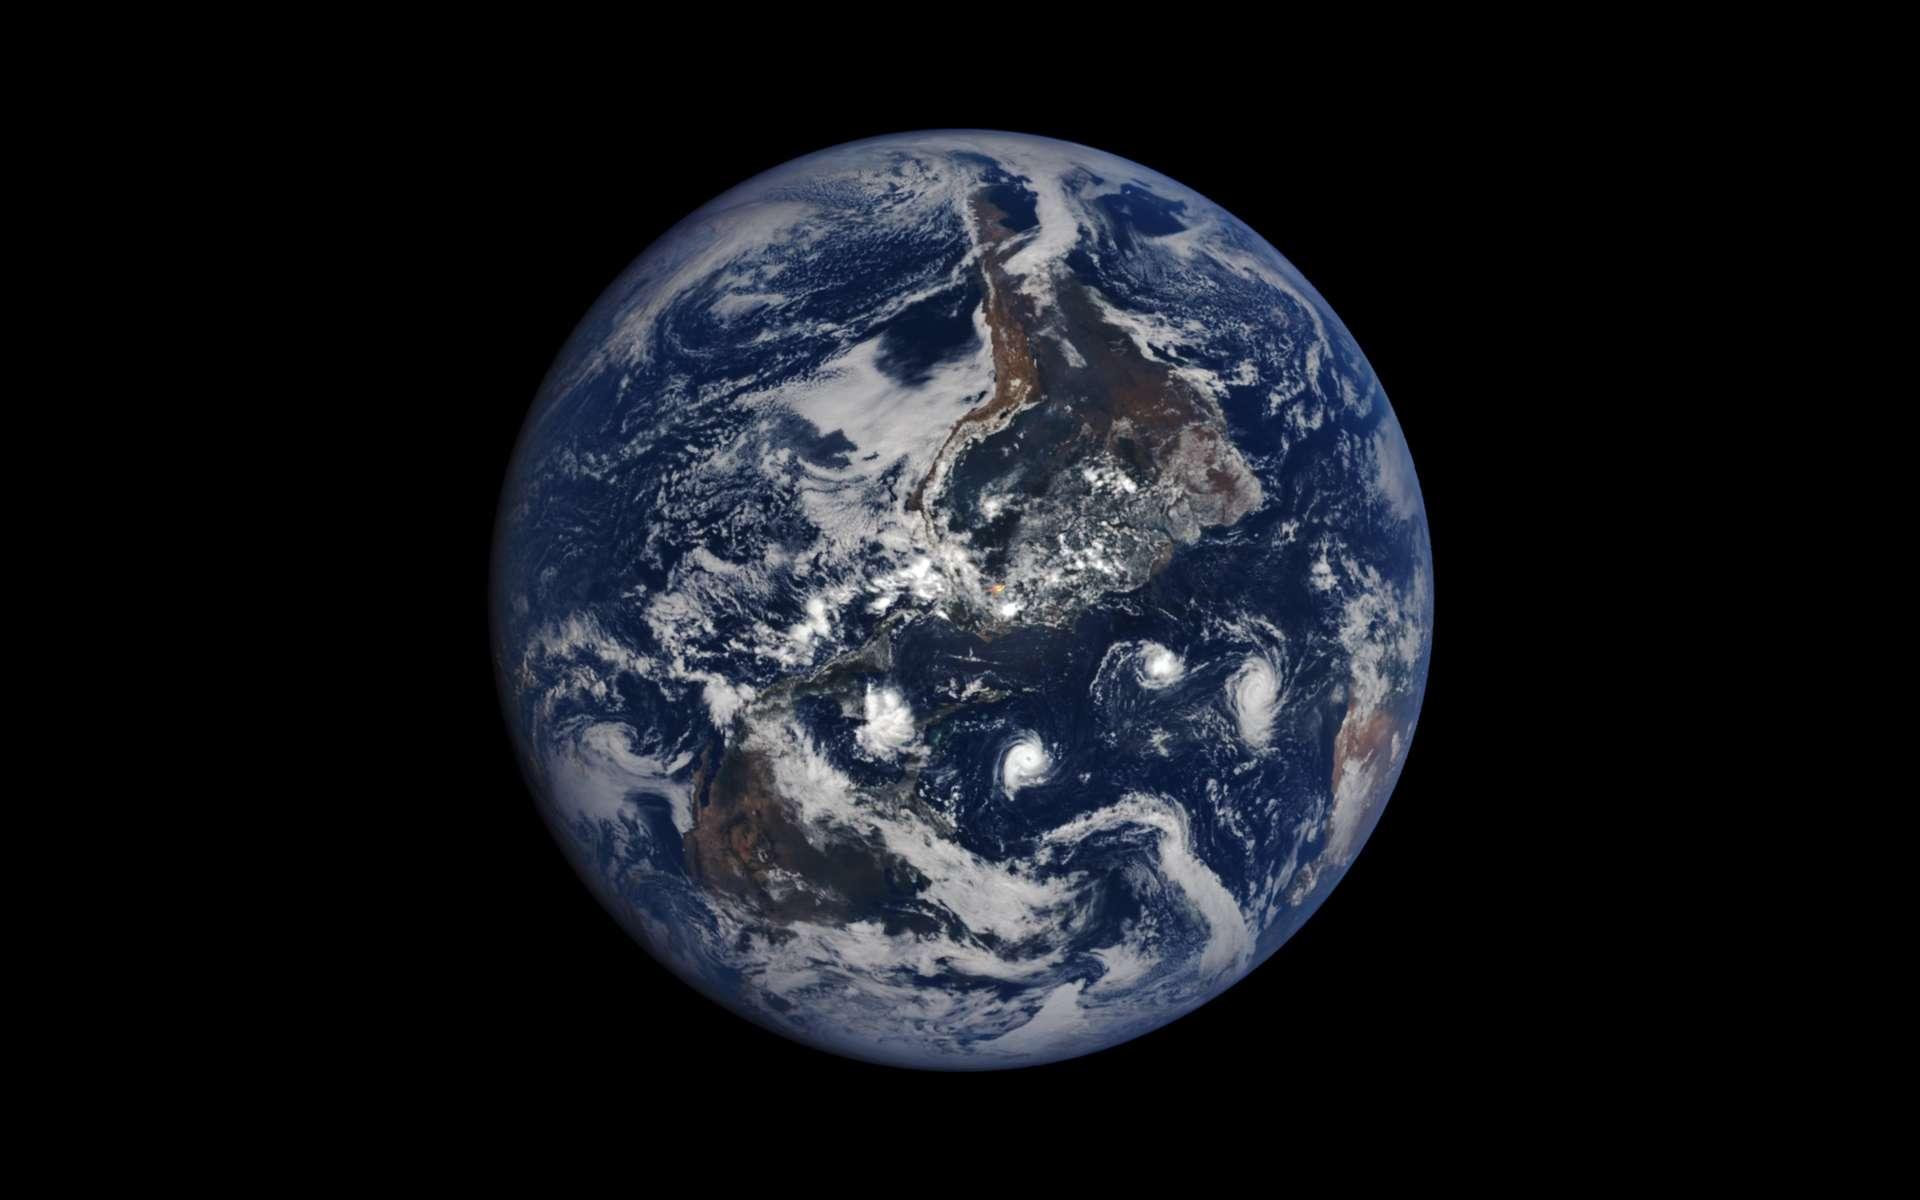 Pourquoi ne sent-on pas que la Terre tourne ?www.futura-sciences.com - Futura